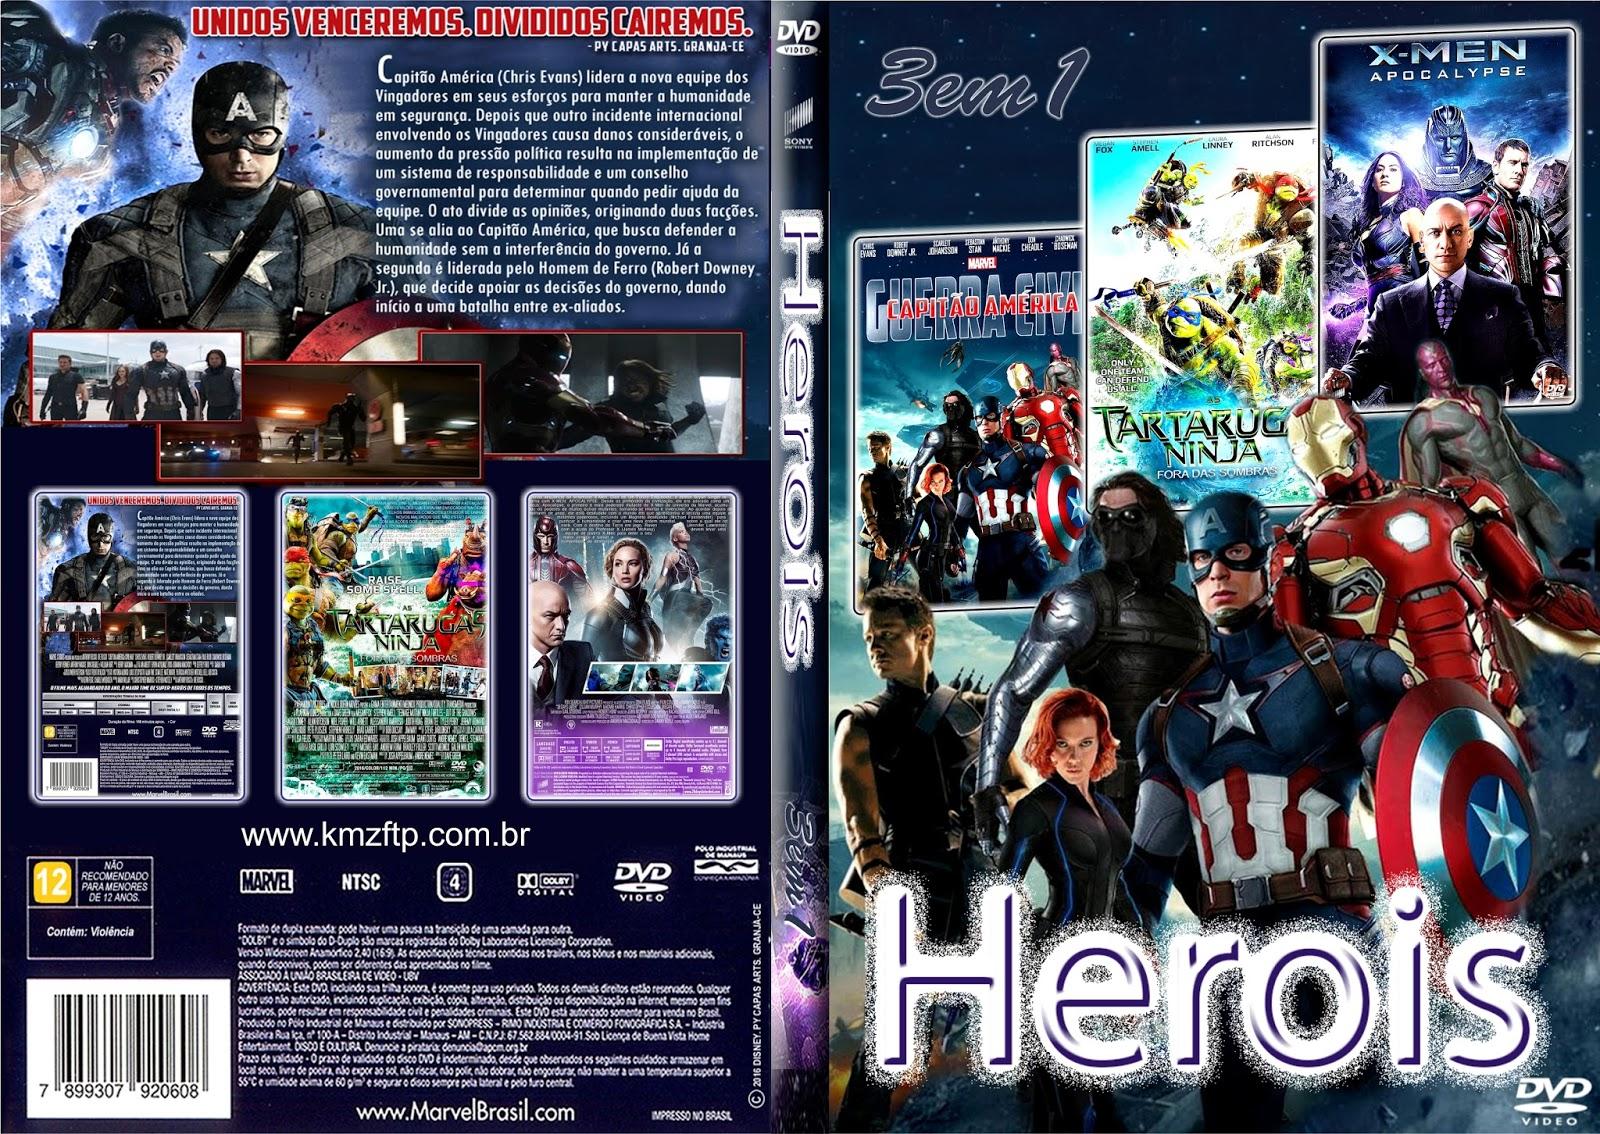 Download Heróis 3X1 DVD-R herois 3em1 www